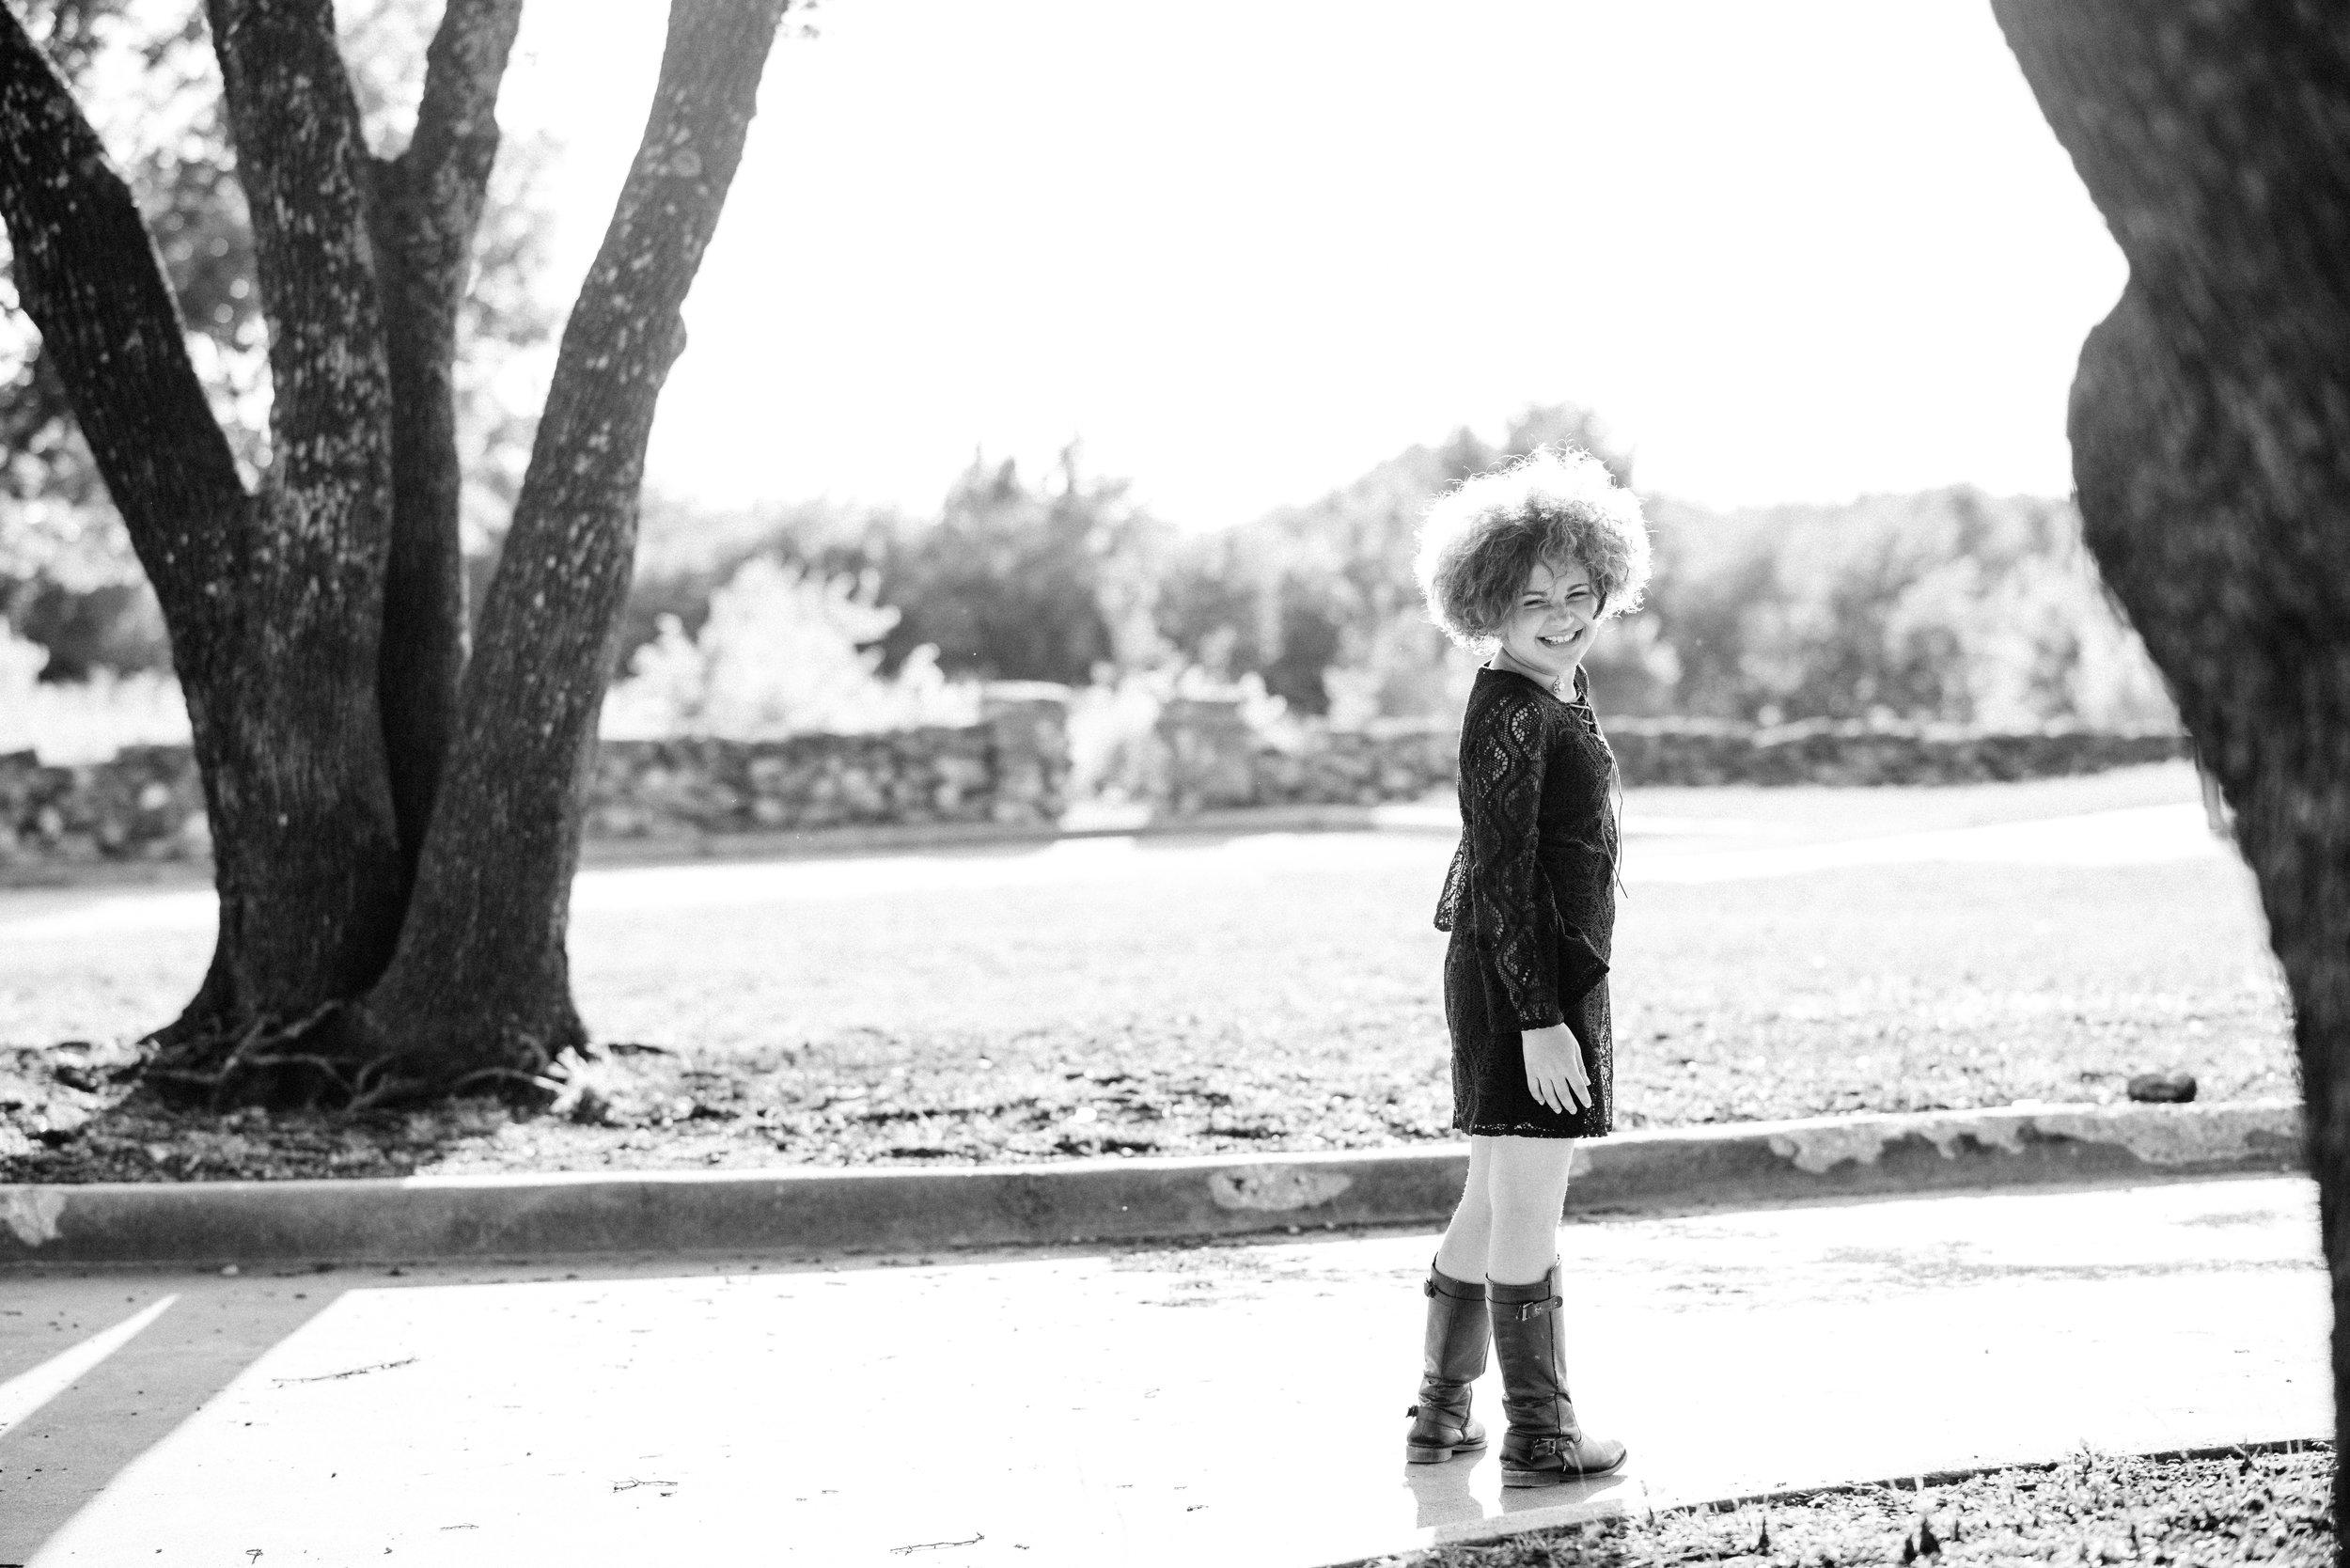 kimberly-peloquin-portraits-tweens-014.jpg